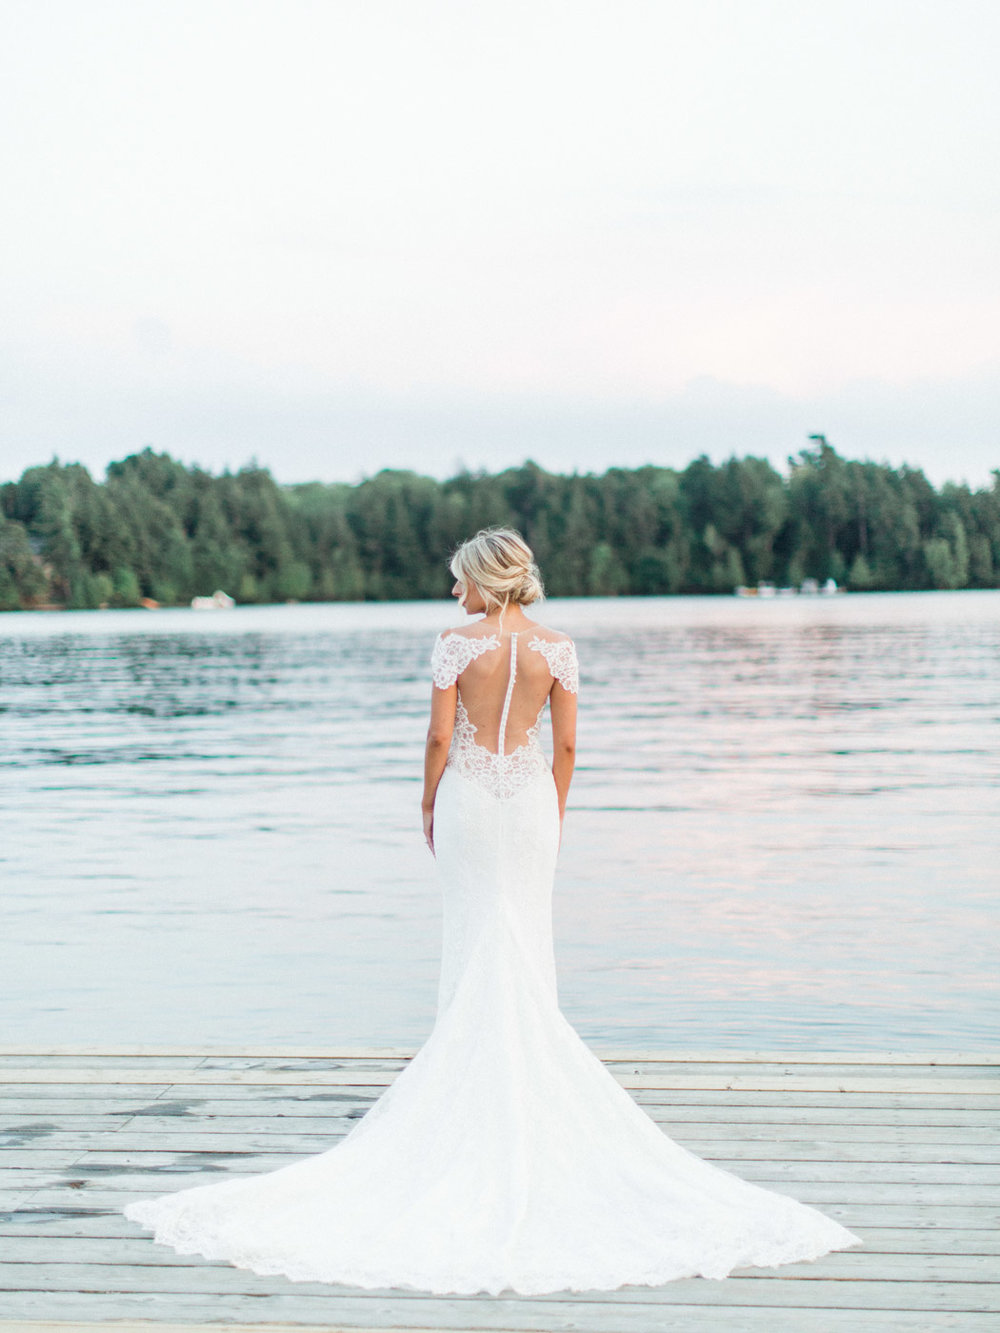 Toronto-Muskoka-wedding-photographer-summery-fun-documentary-the-marriott-rosseau125.jpg